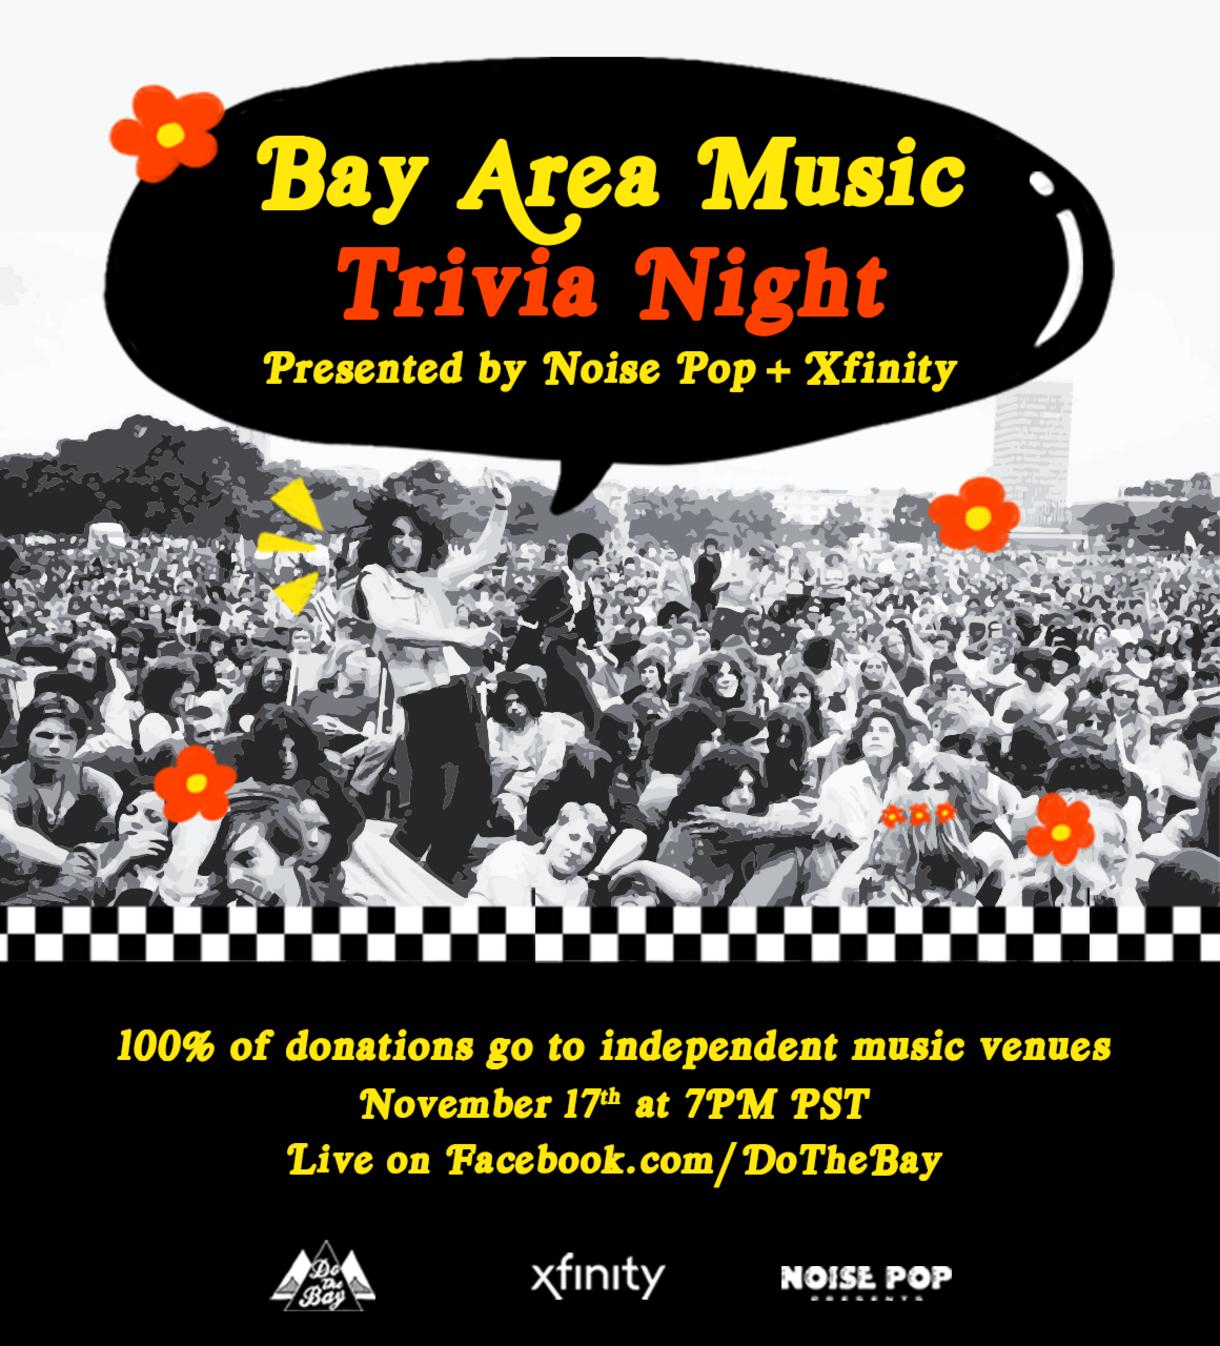 Bay Area Music Trivia Night